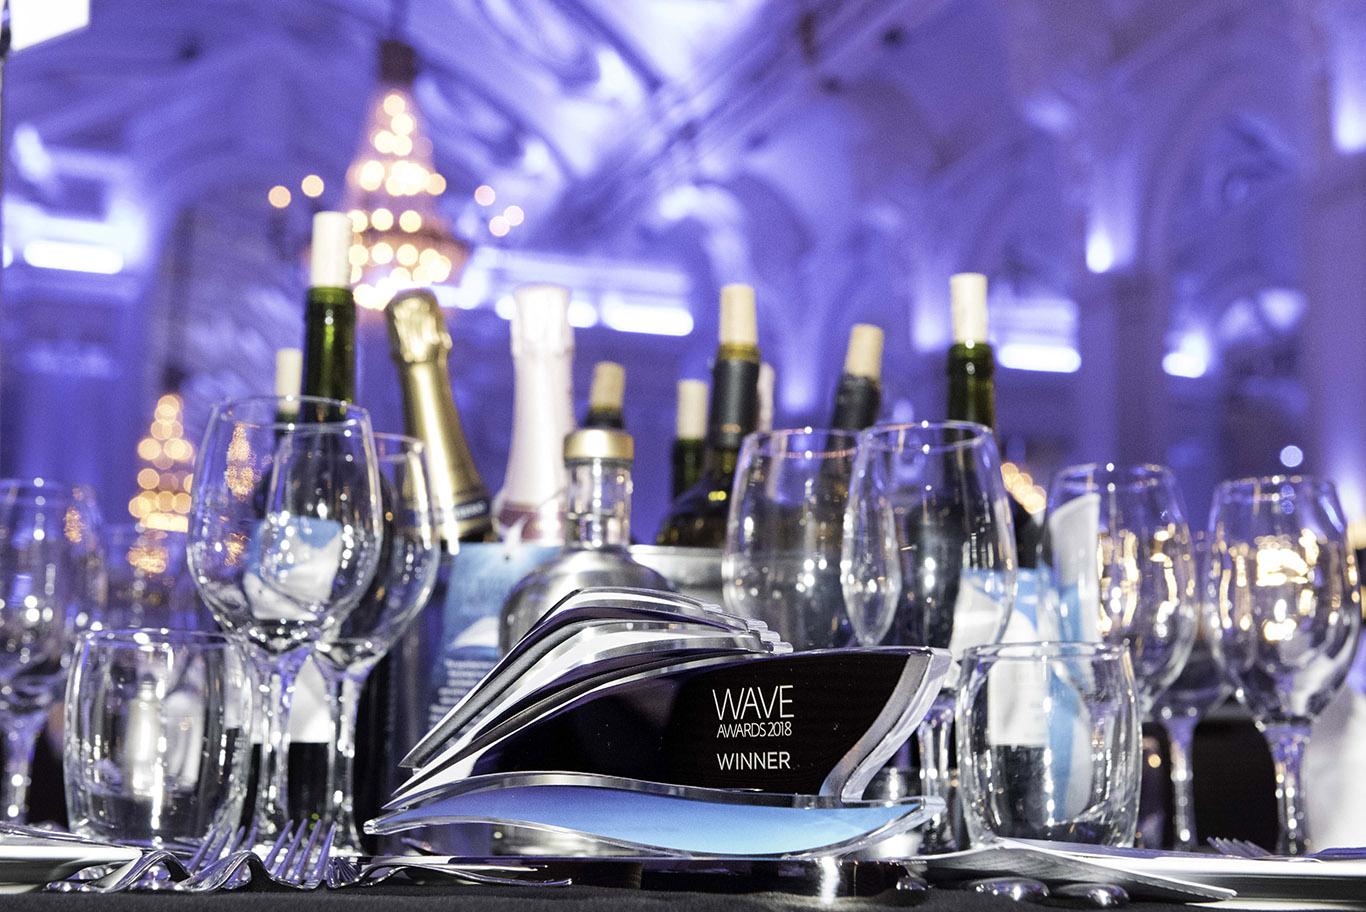 Wave Awards 2019